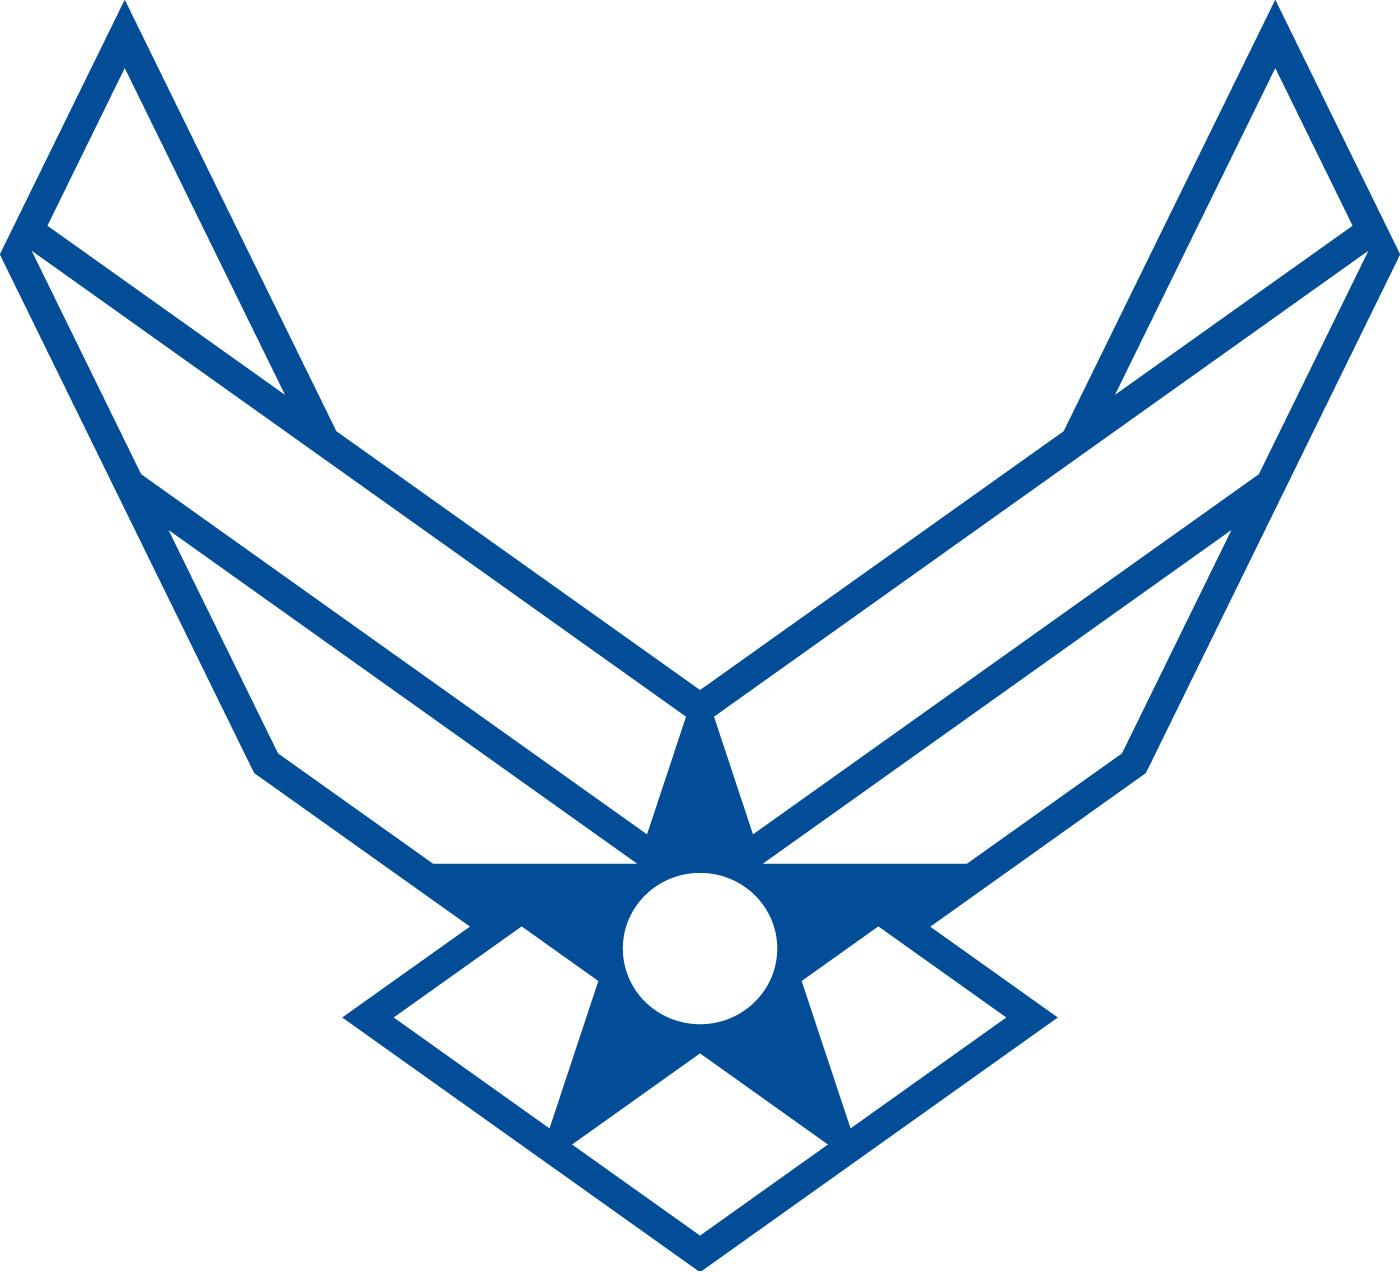 air force logo clip art - ClipArt Best - ClipArt Best